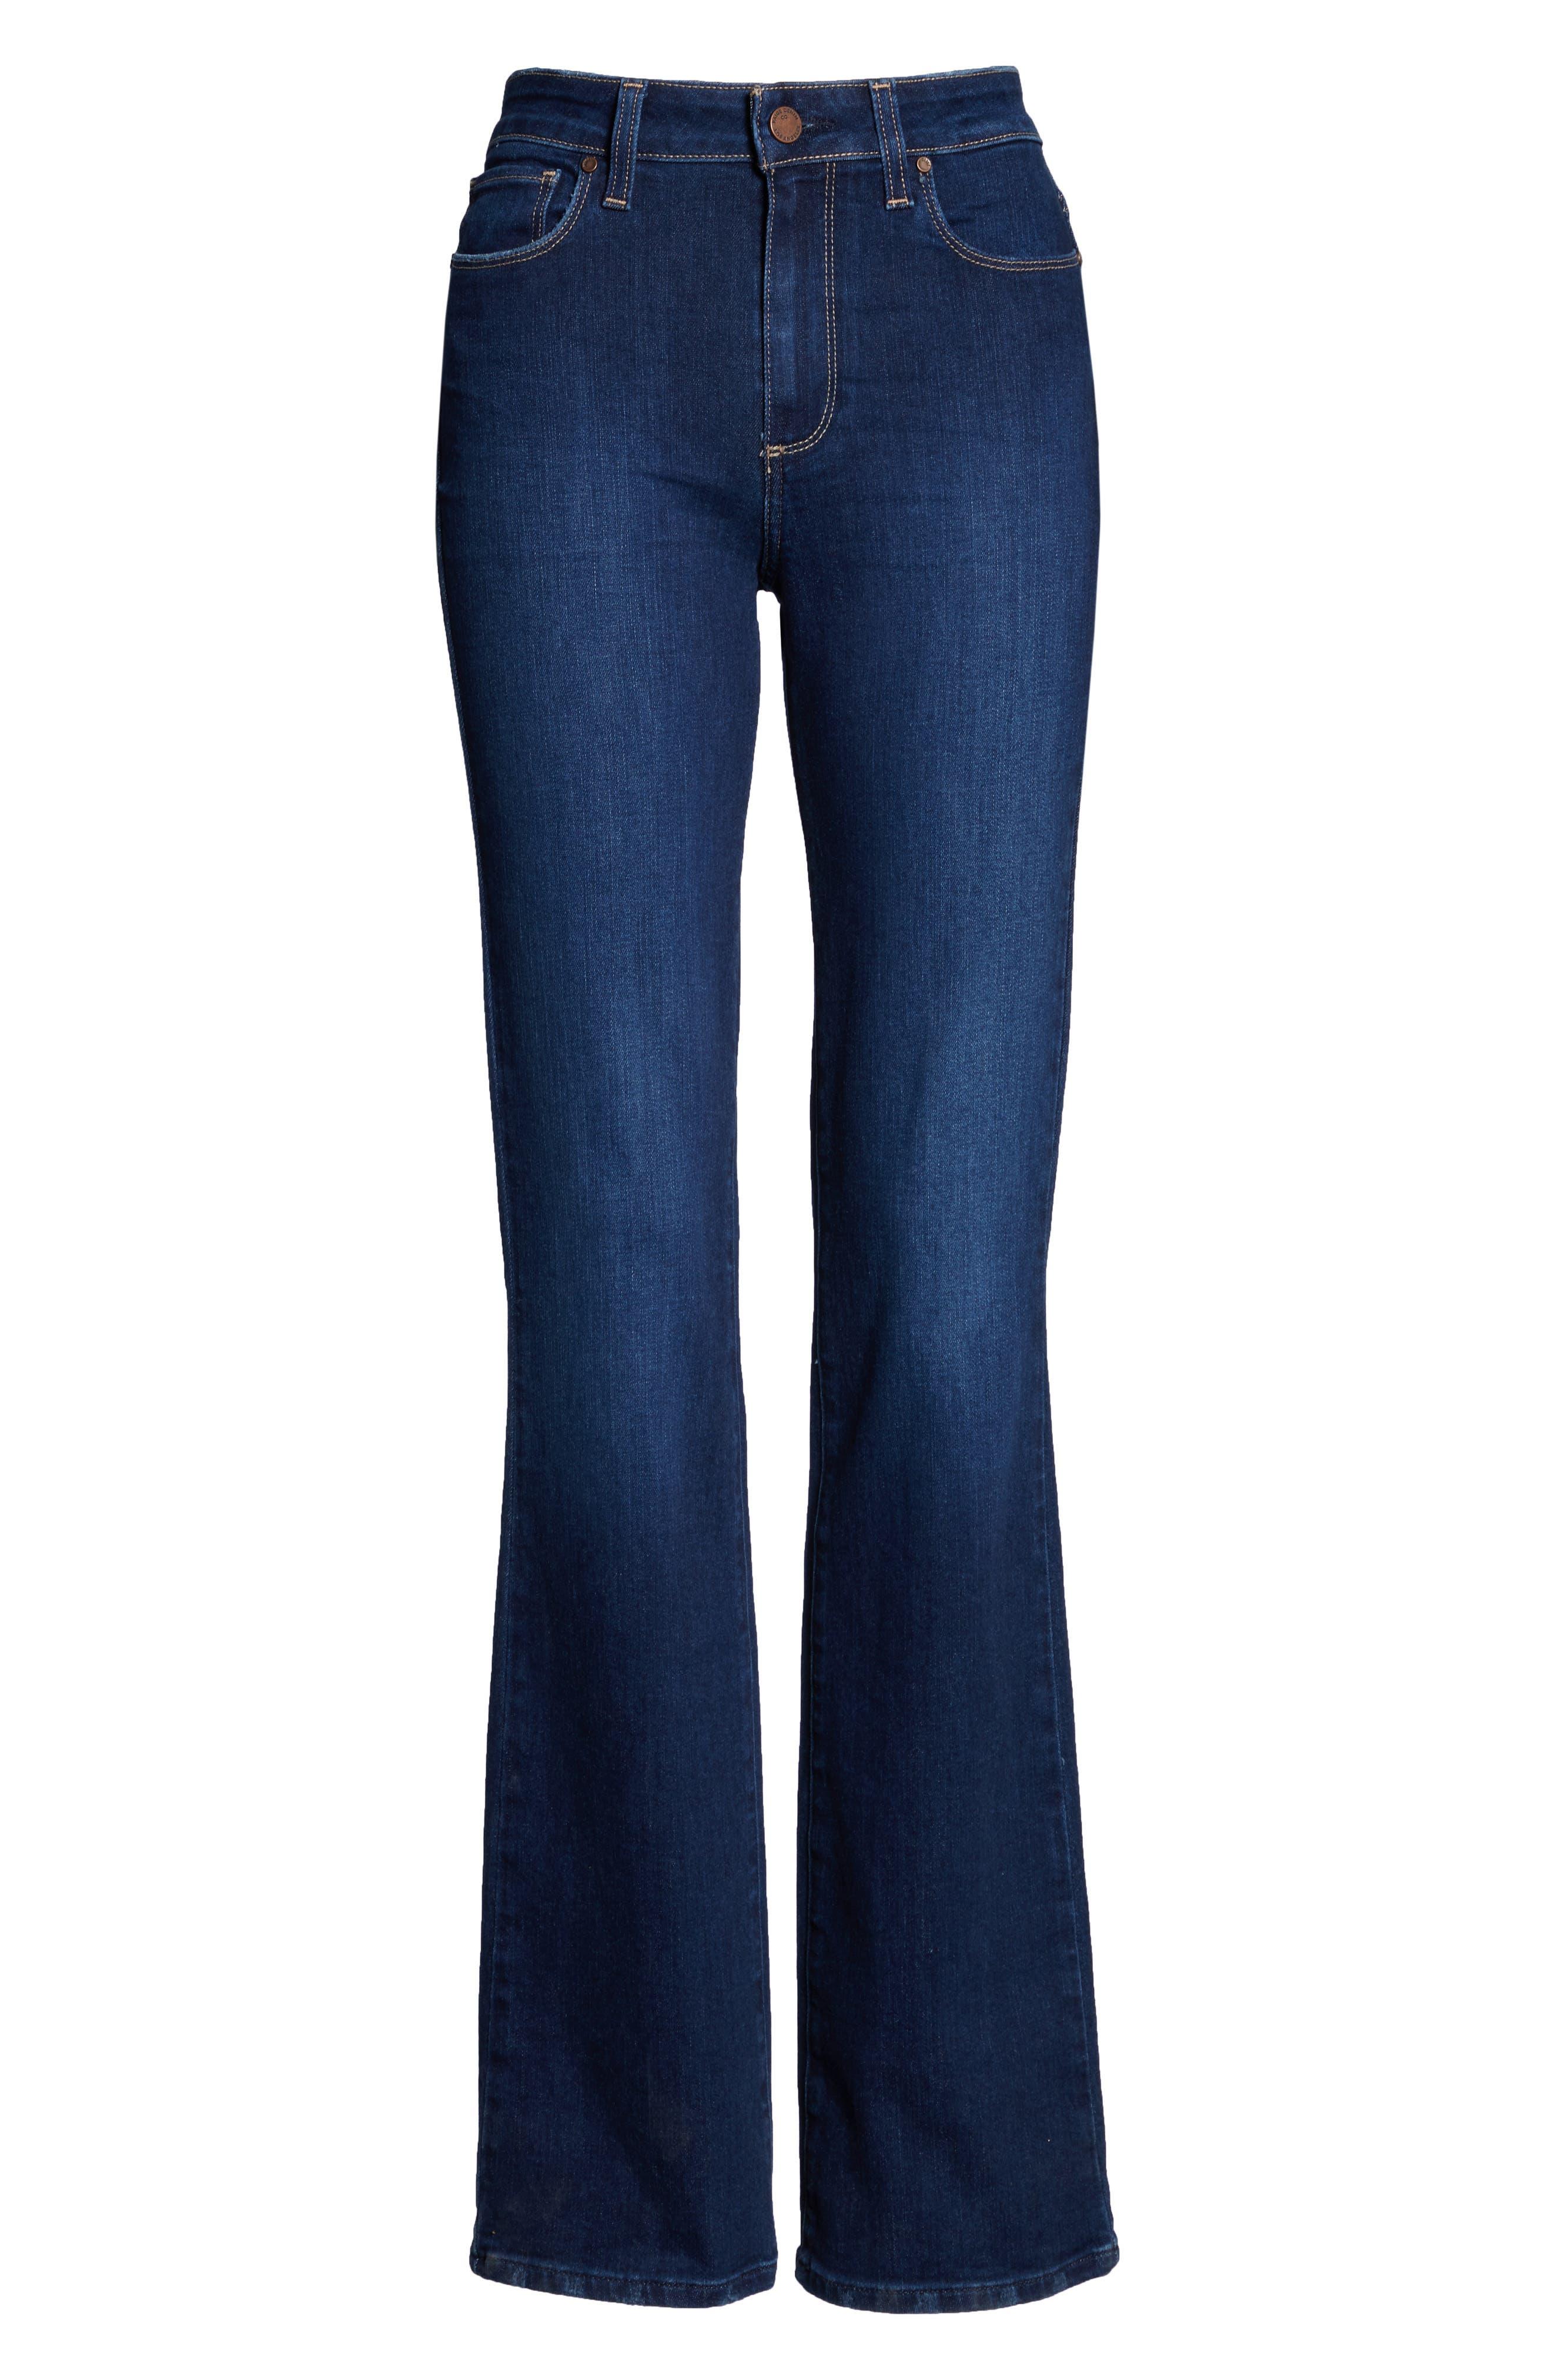 Transcend Vintage - Manhattan Bootcut Jeans,                             Alternate thumbnail 6, color,                             POMPEII